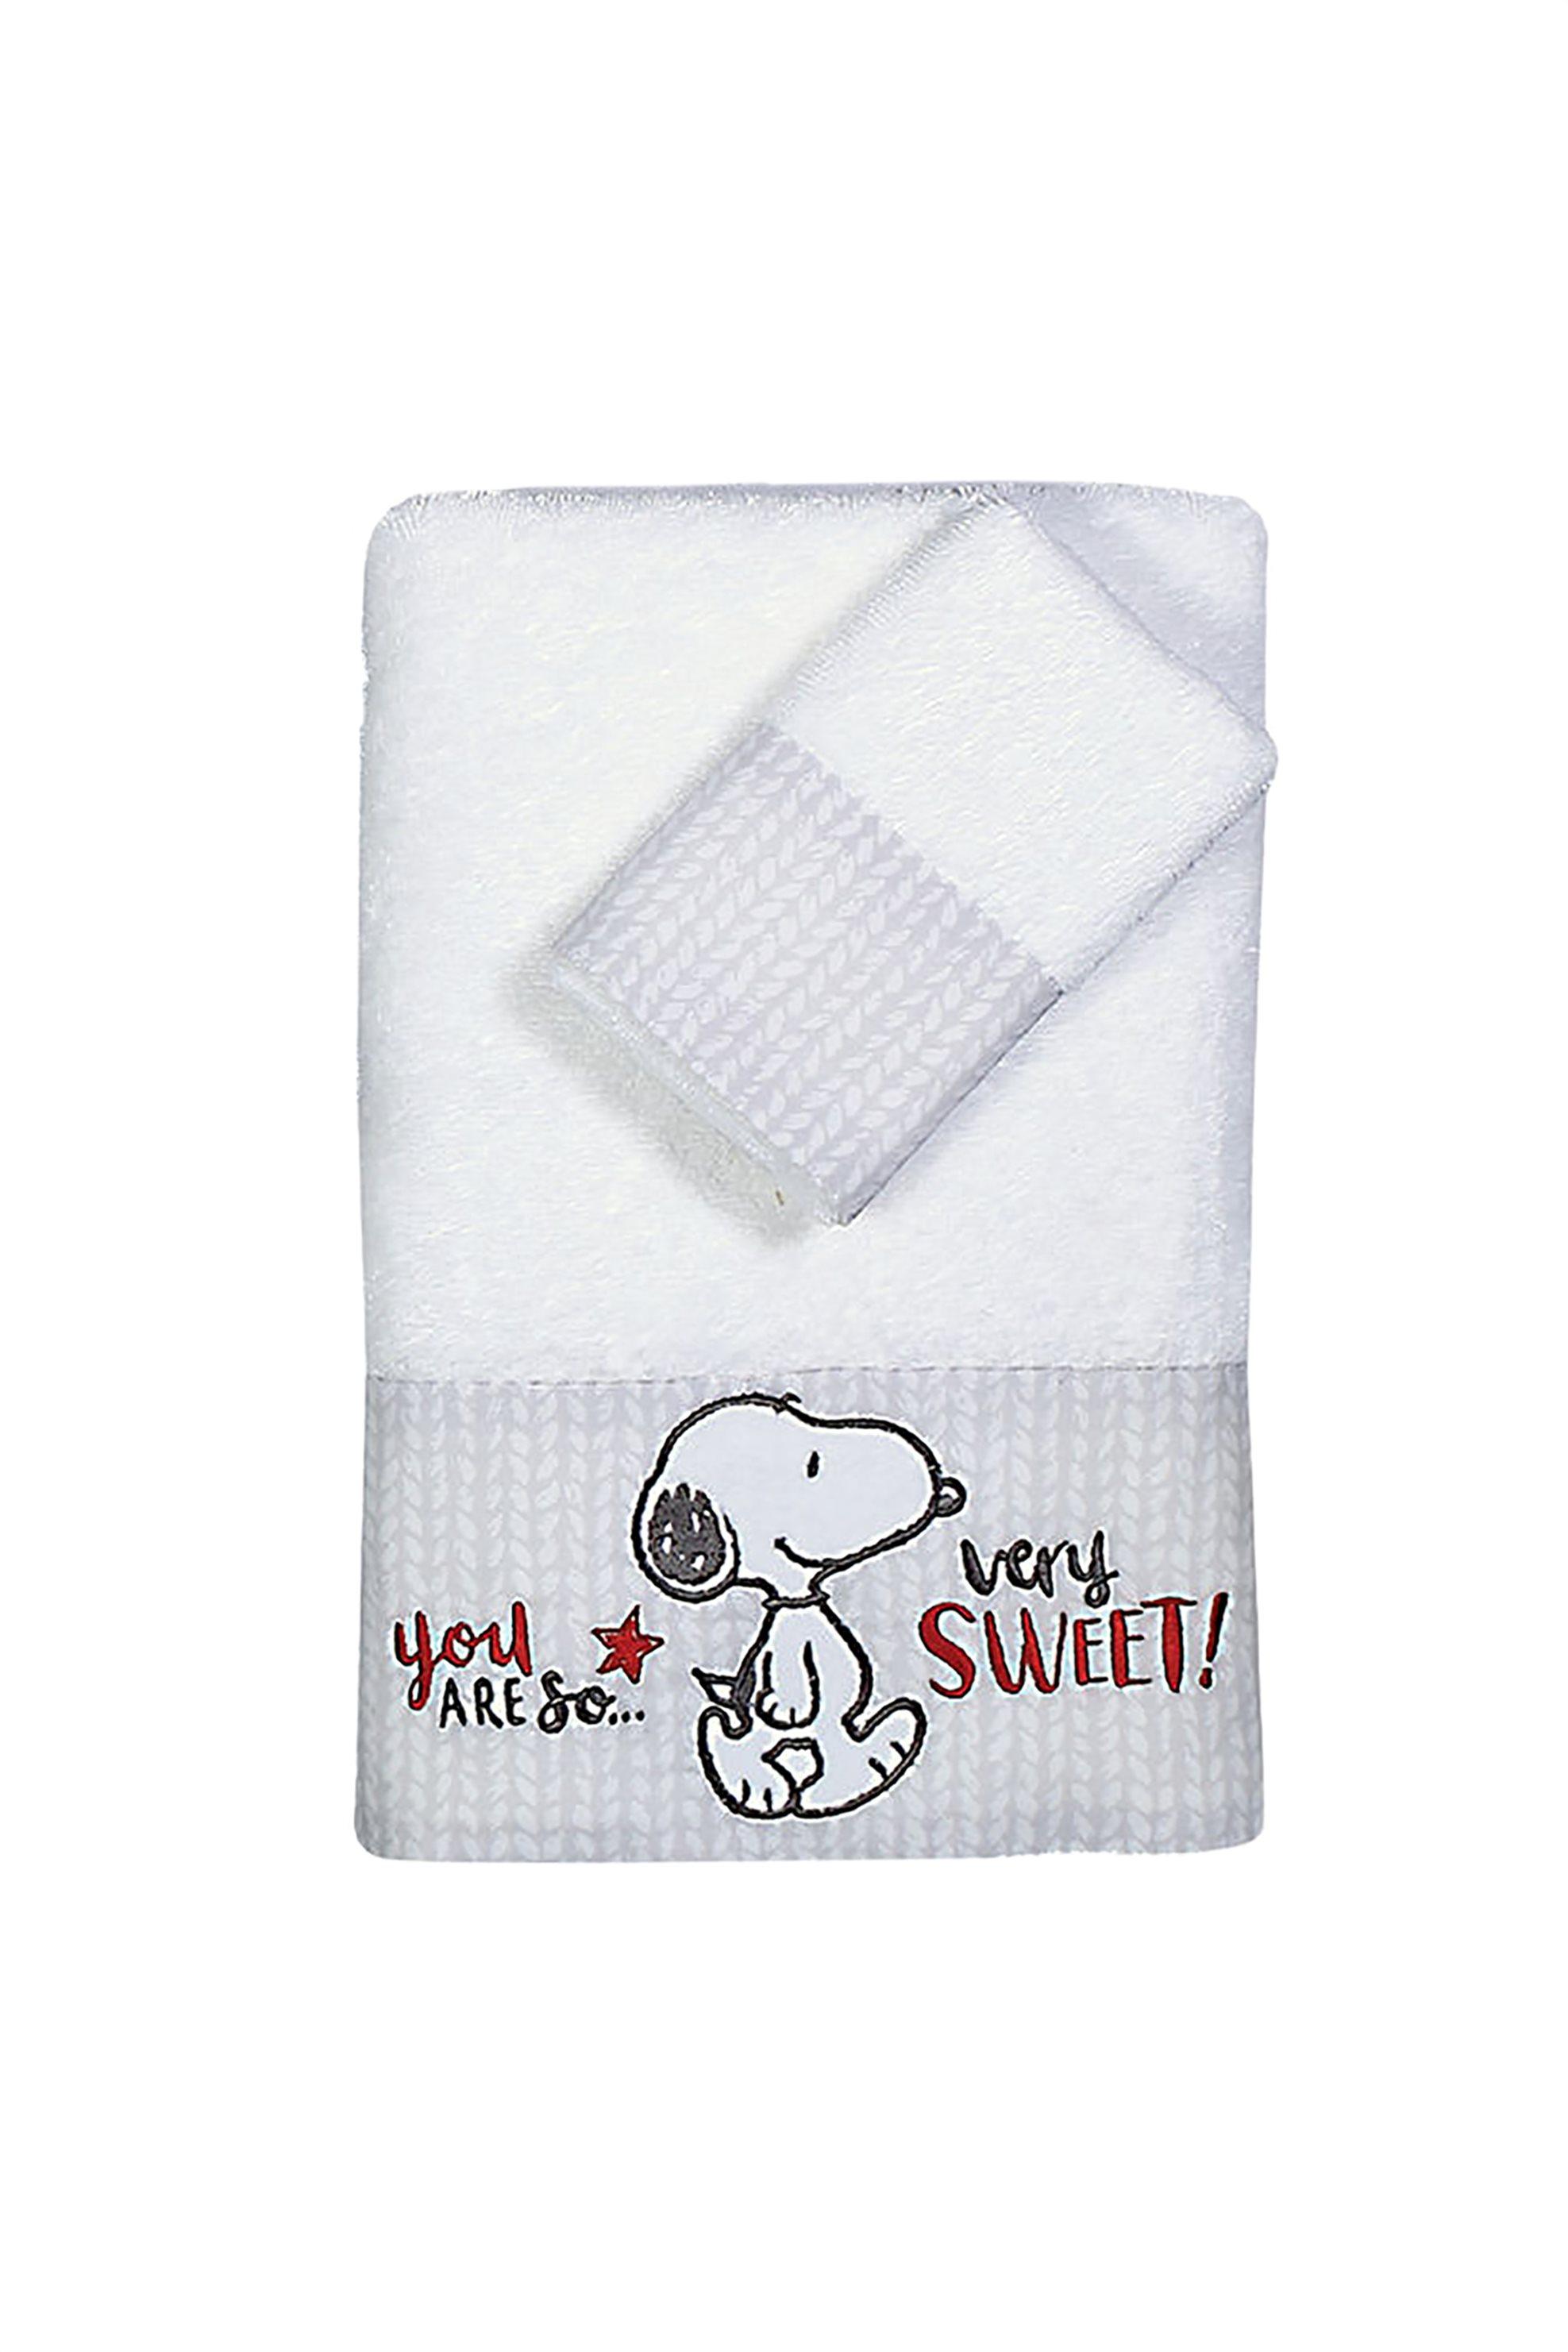 NEF-NEF Σετ βρεφικές πετσέτες Sweet Snoopy (2 τεμάχια) - 022867 - Λευκό home   παιδια   πετσέτες   σετ παιδικές πετσέτες